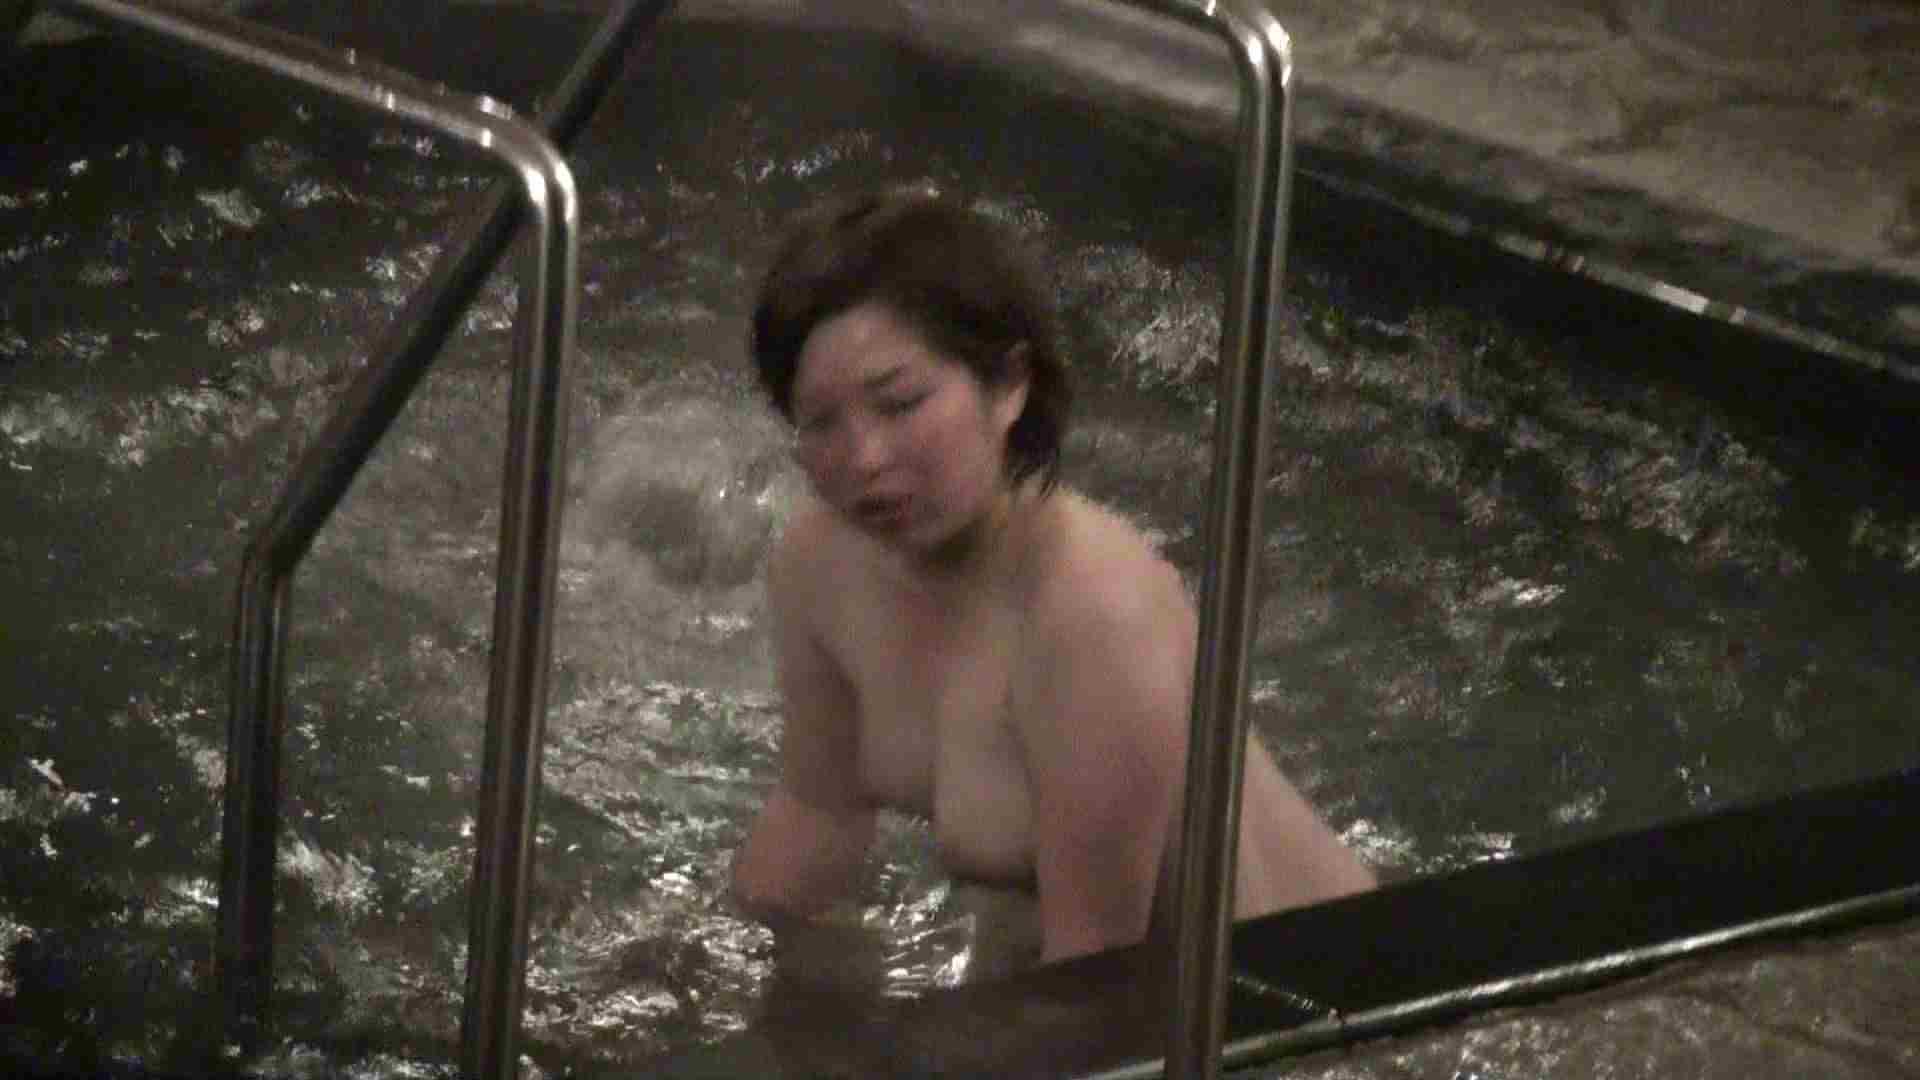 Aquaな露天風呂Vol.432 盗撮   OLエロ画像  86PICs 58